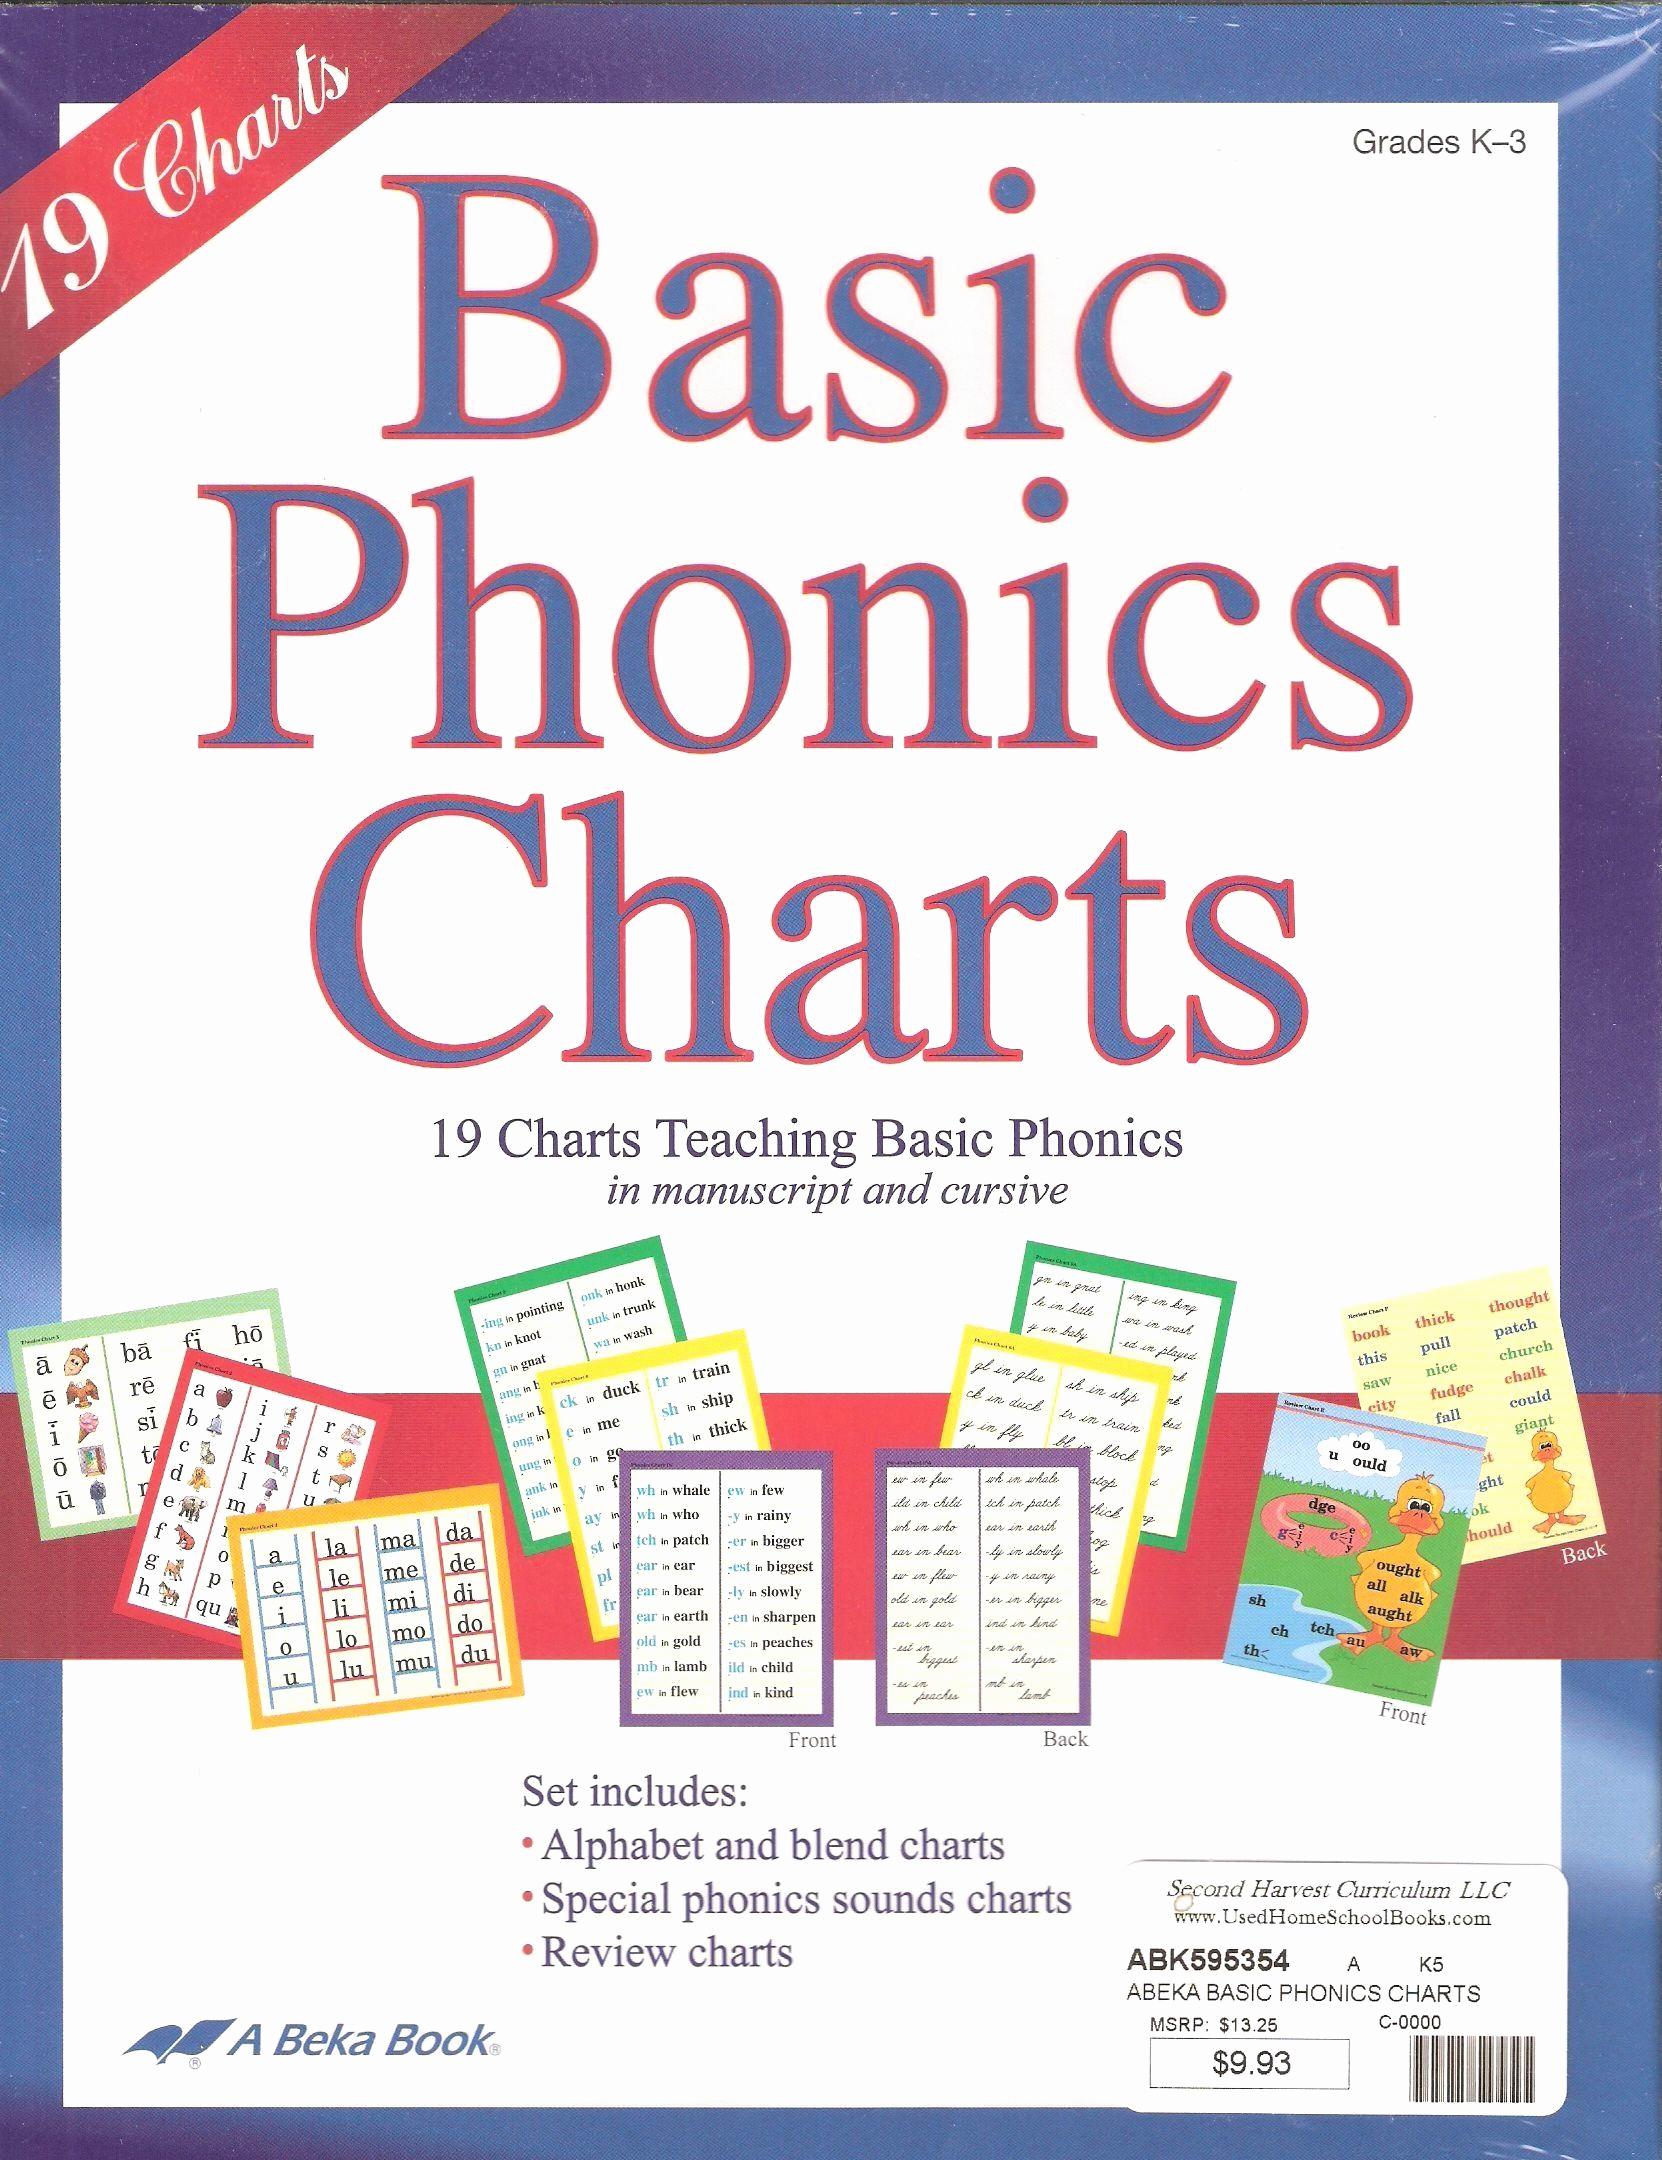 Free Printable Abeka Worksheets Inspirational Free Printable Abeka Worksheets Abeka Basic Phonics Charts